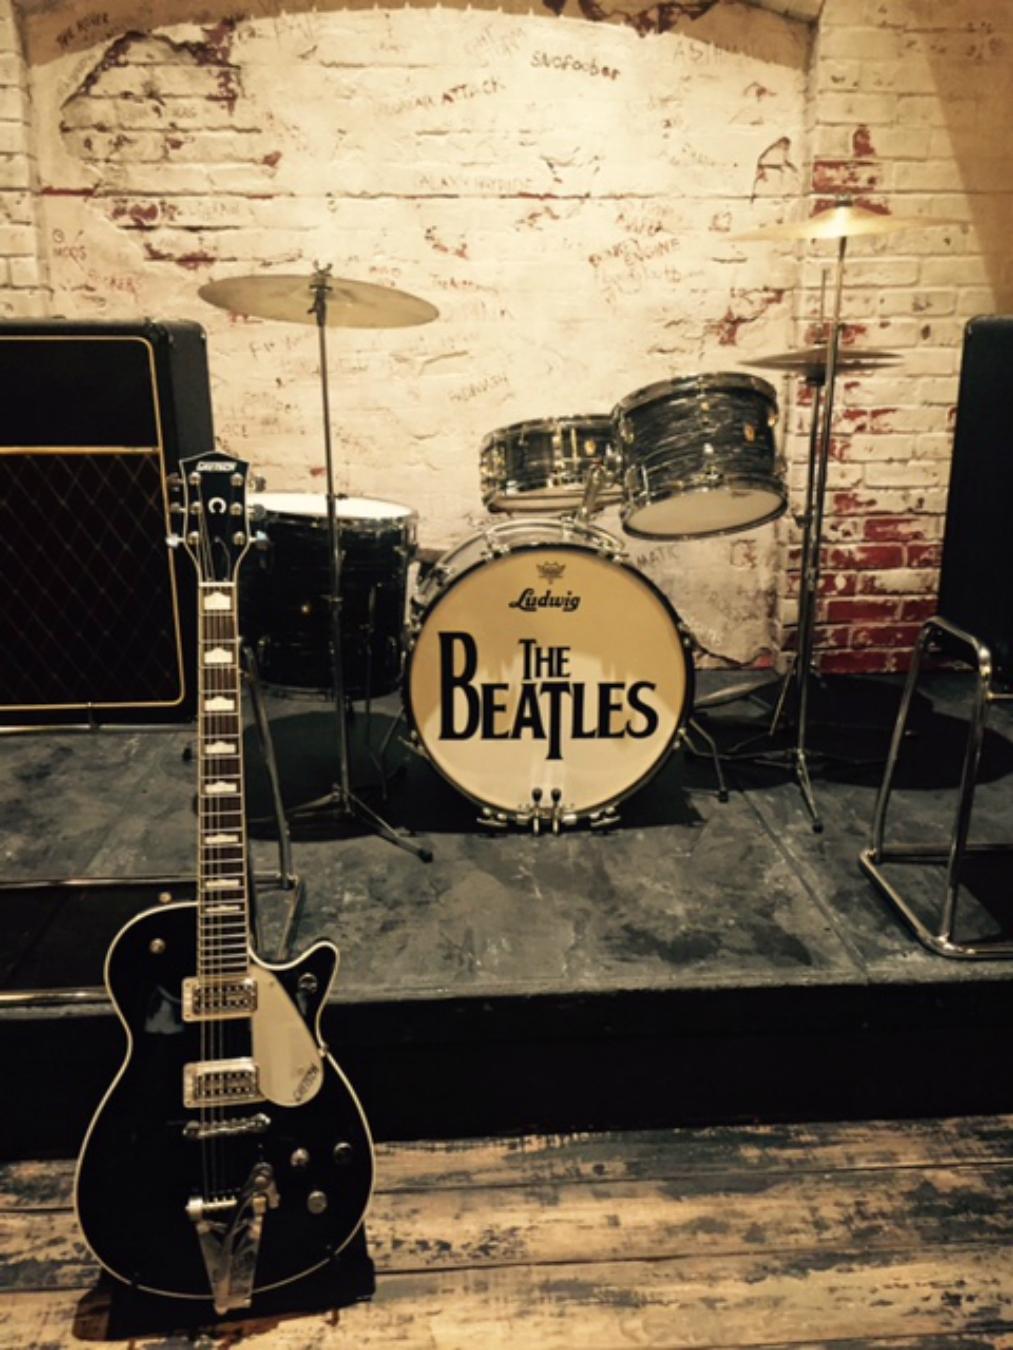 MONTE Blog: The Beates